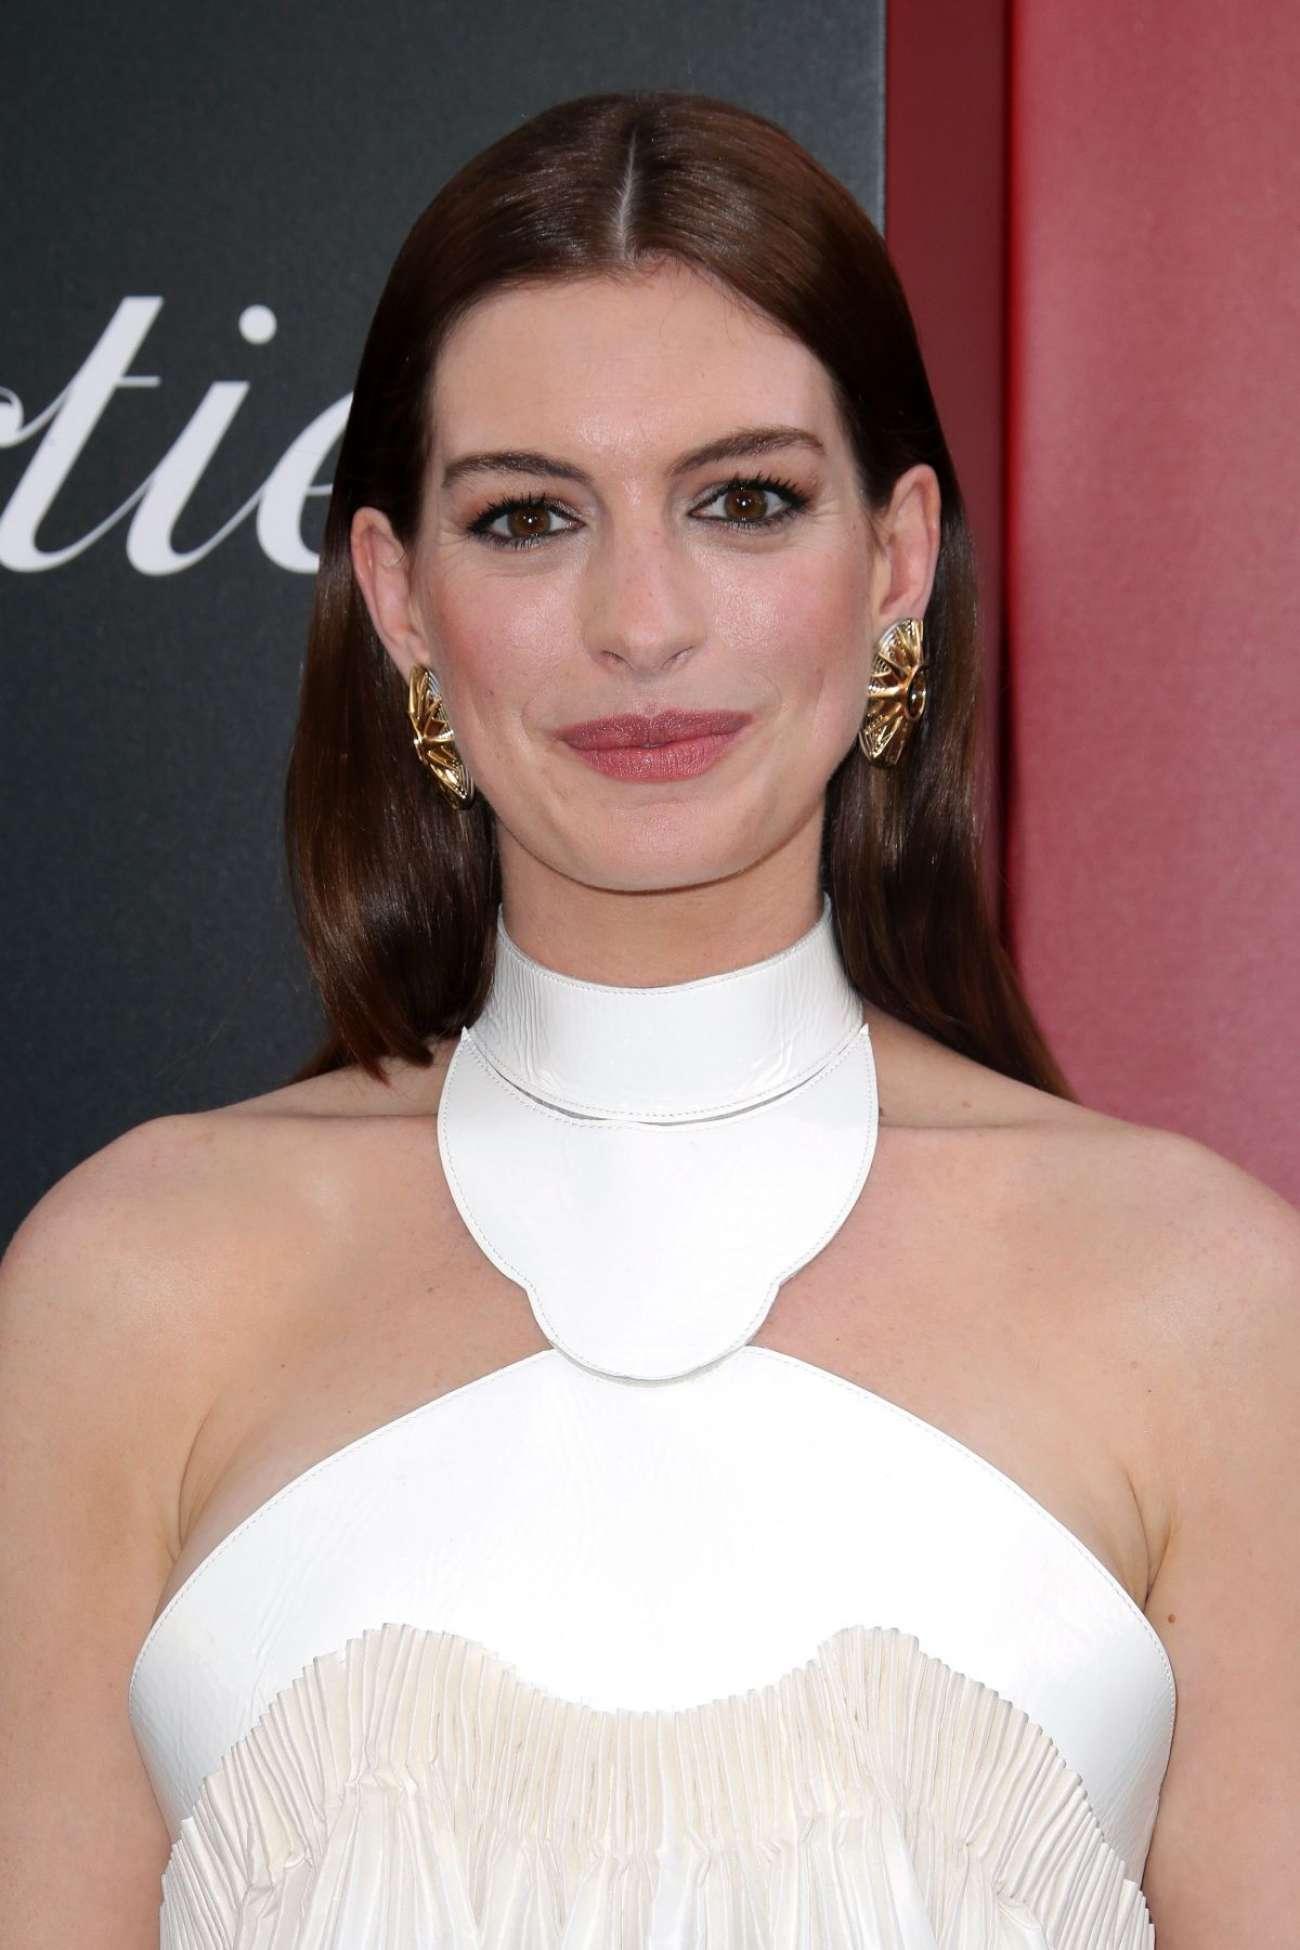 Anne Hathaway 2018 : Anne Hathaway: Ocean's 8 Premiere photocall In New York-17